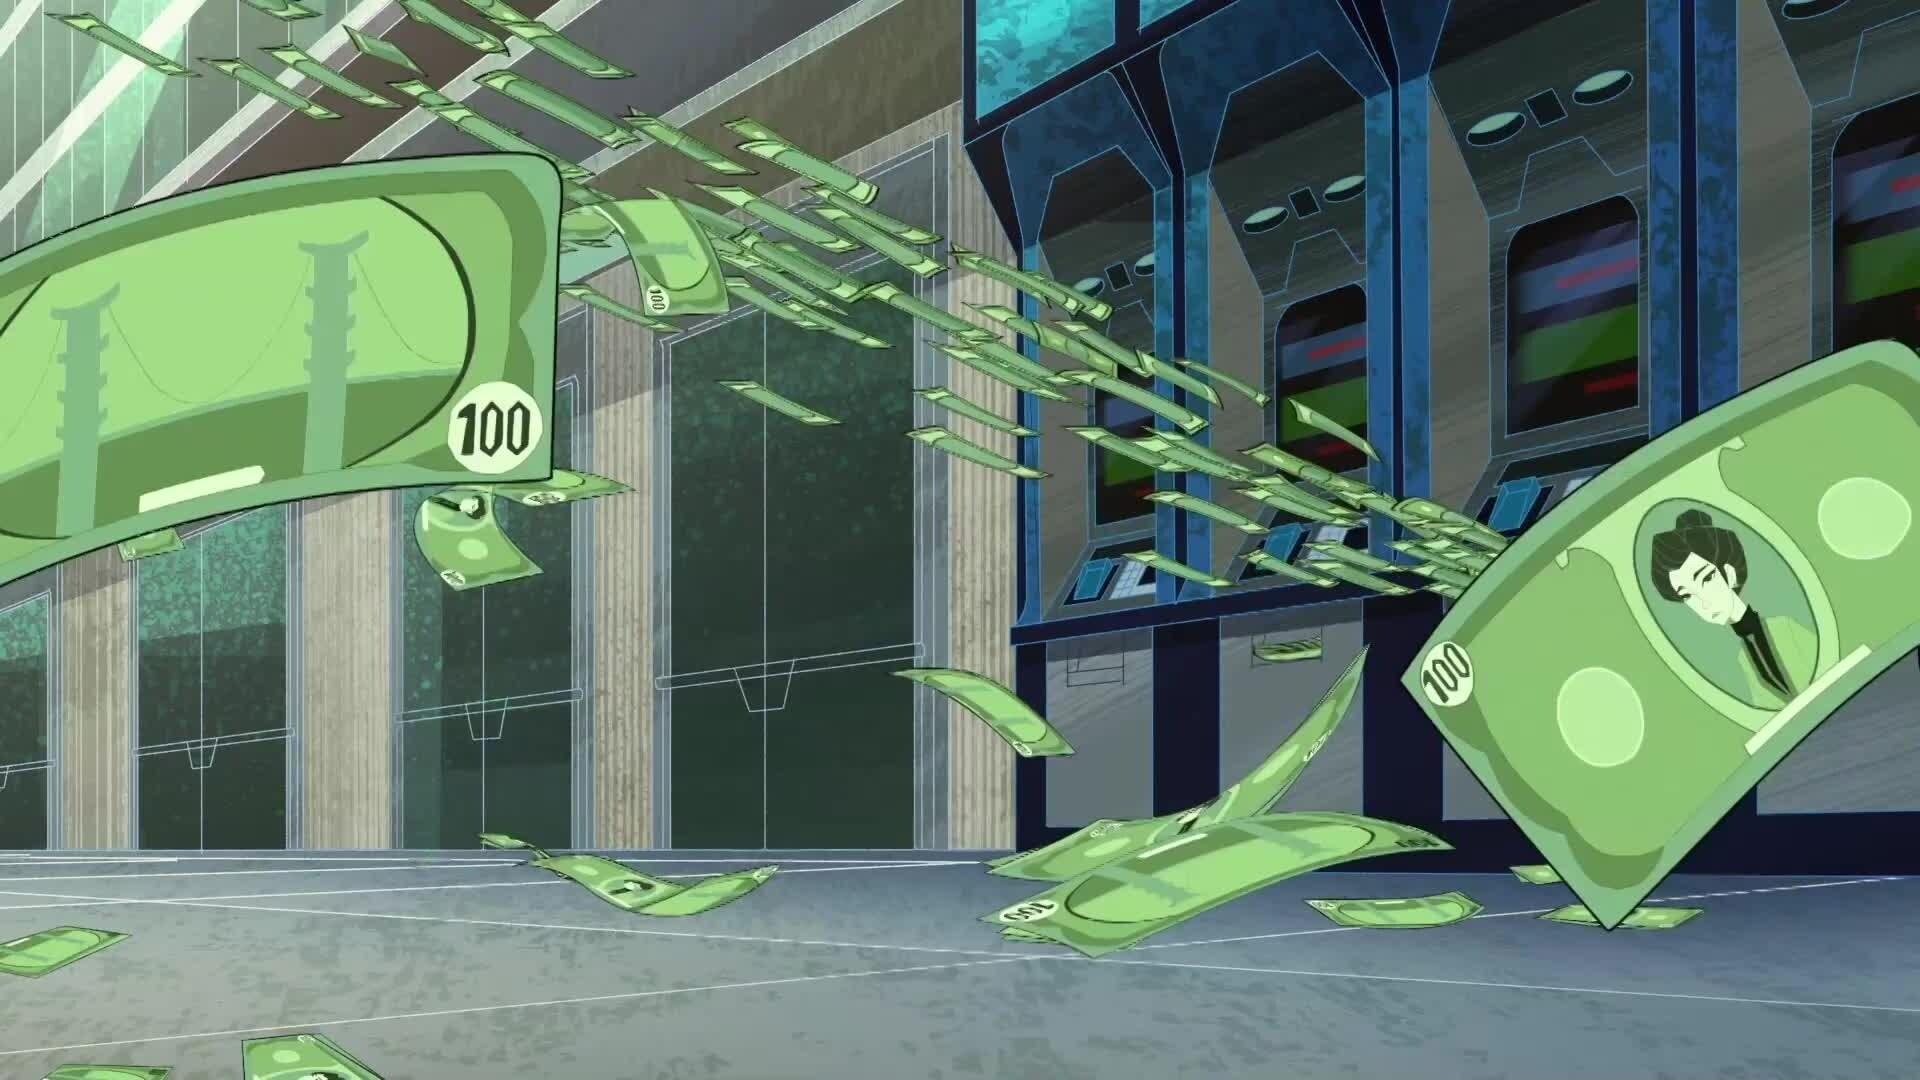 Baymax: Robowabohu in Serie - Der Bot-Fighter